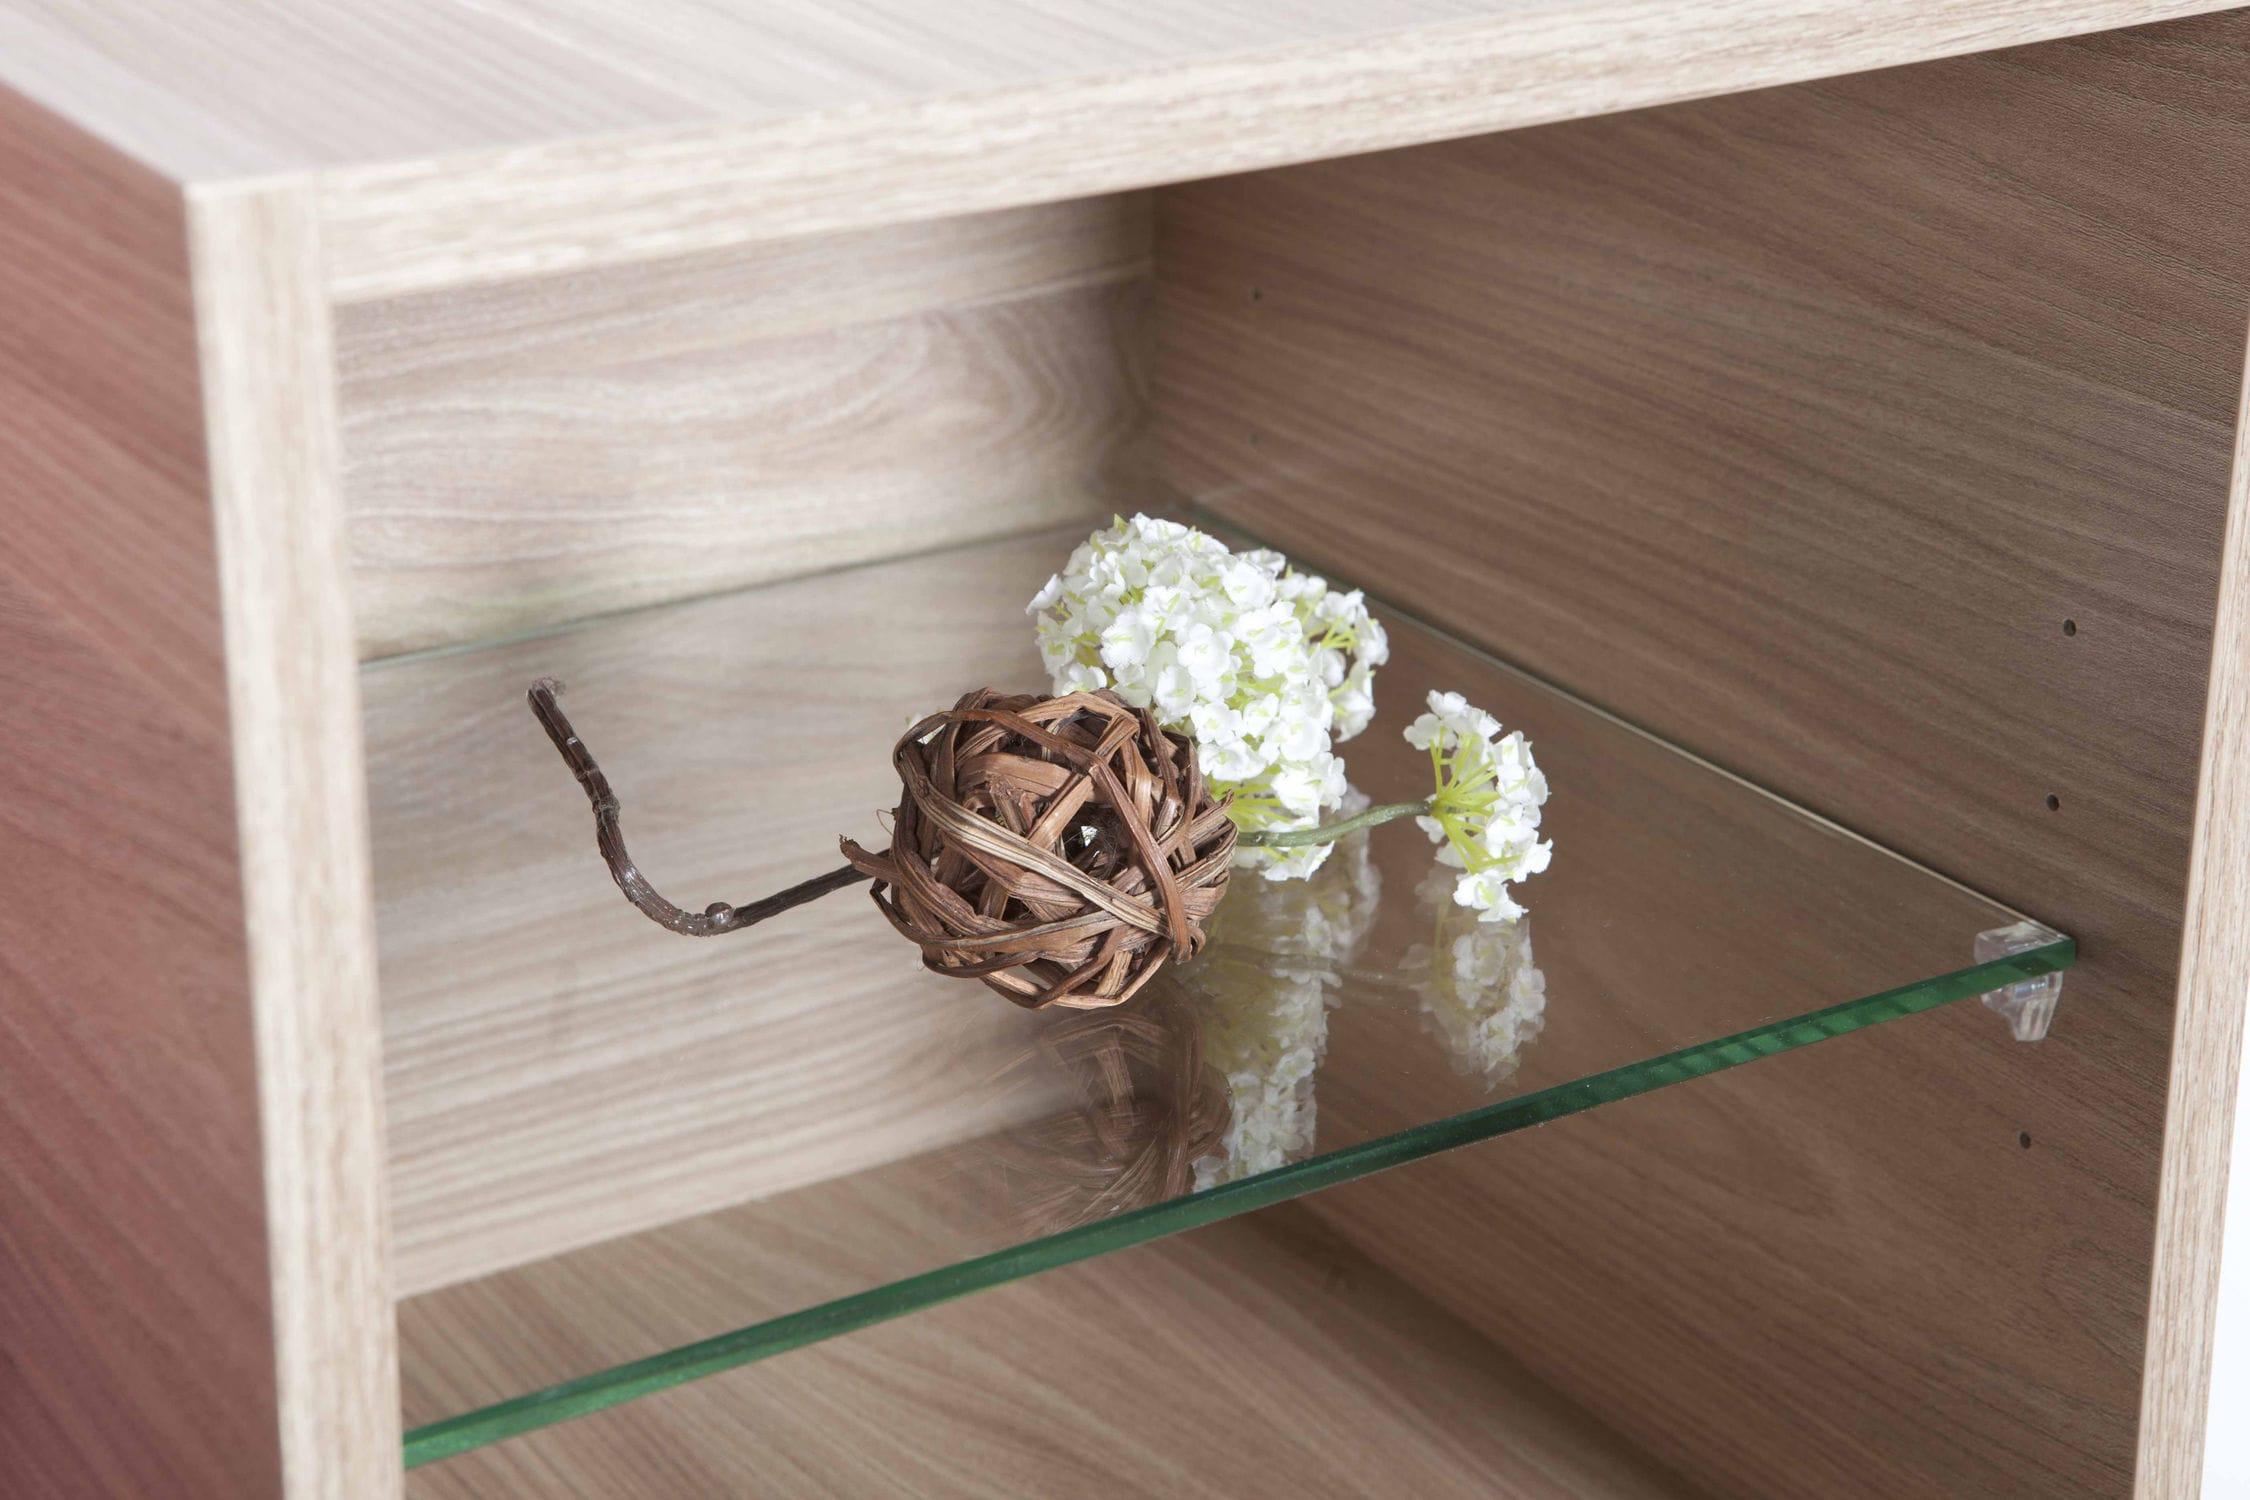 Wandmontiertes Regal / modern / Holz / Badezimmer - MODULO - FRAMO